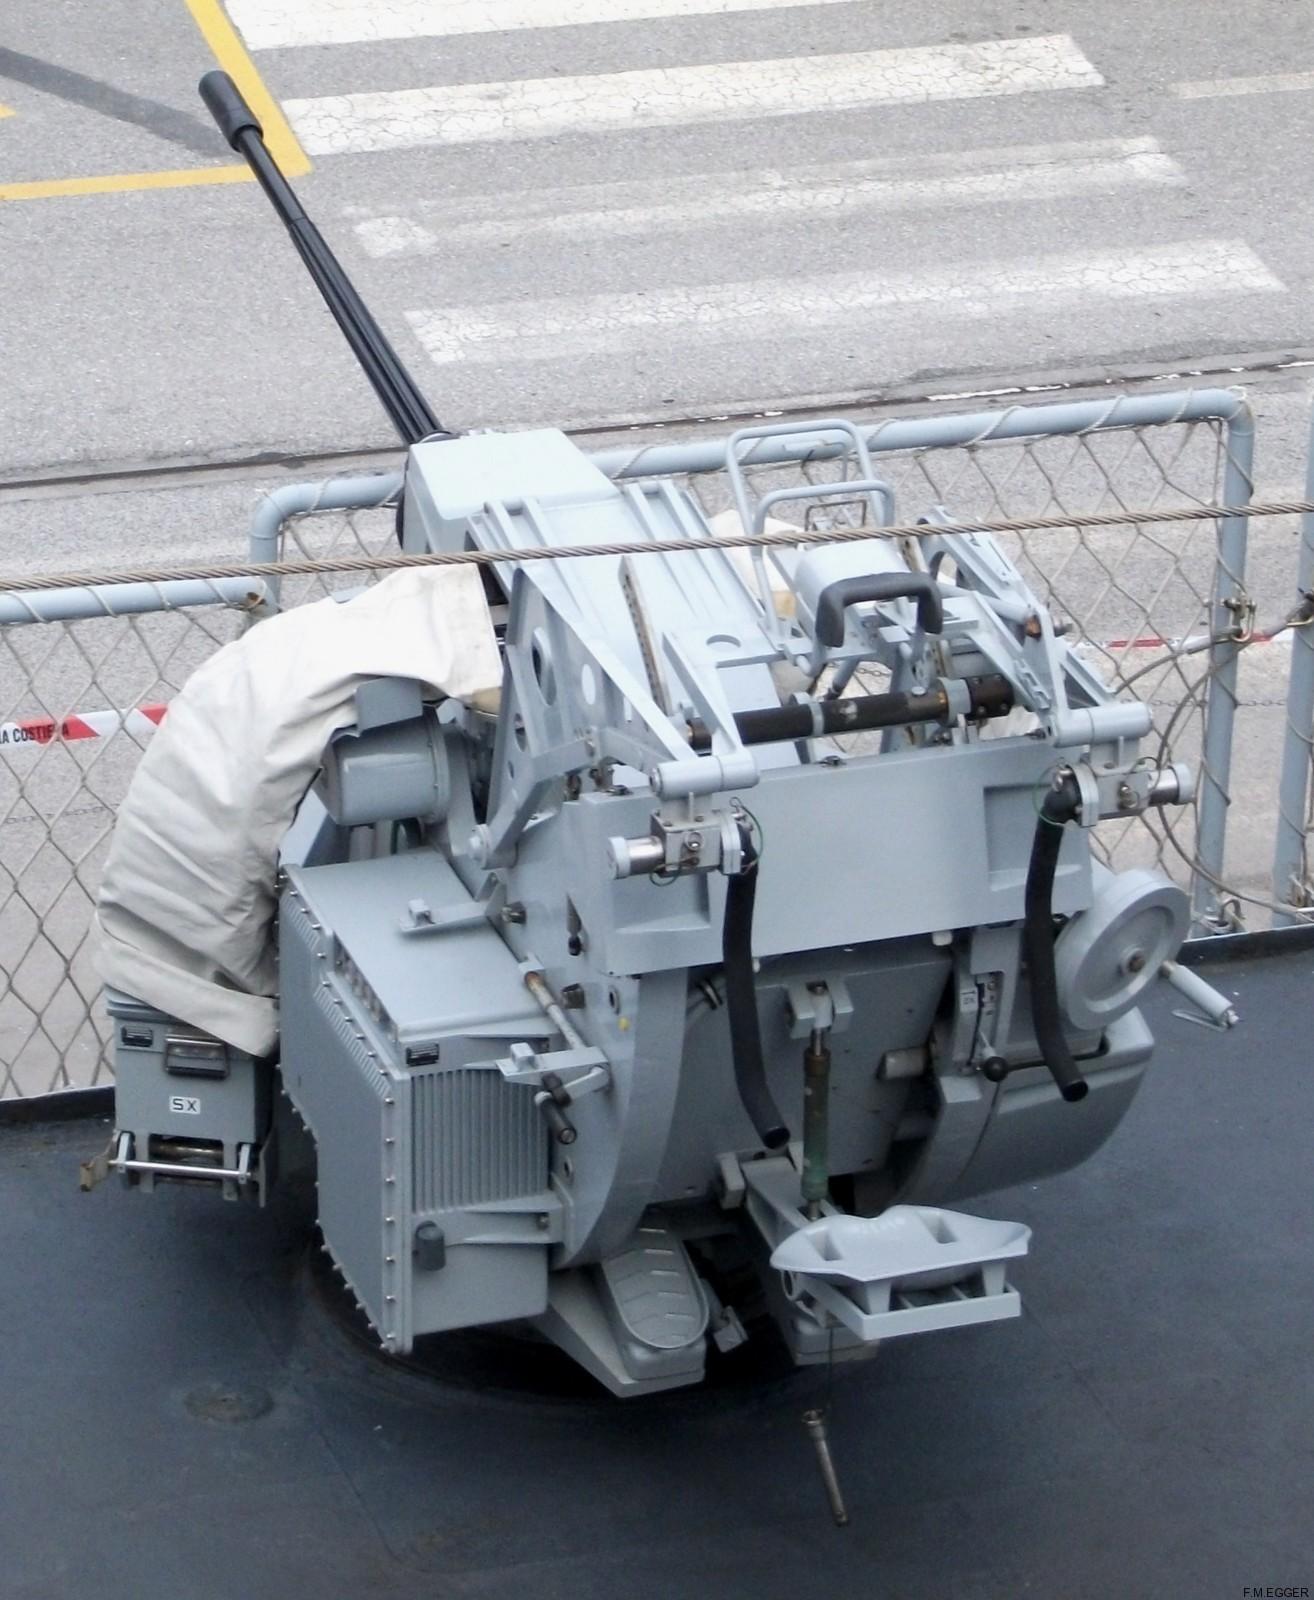 Oto-Melara Breda Oerlikon KBA 25/80 mm machine gun system